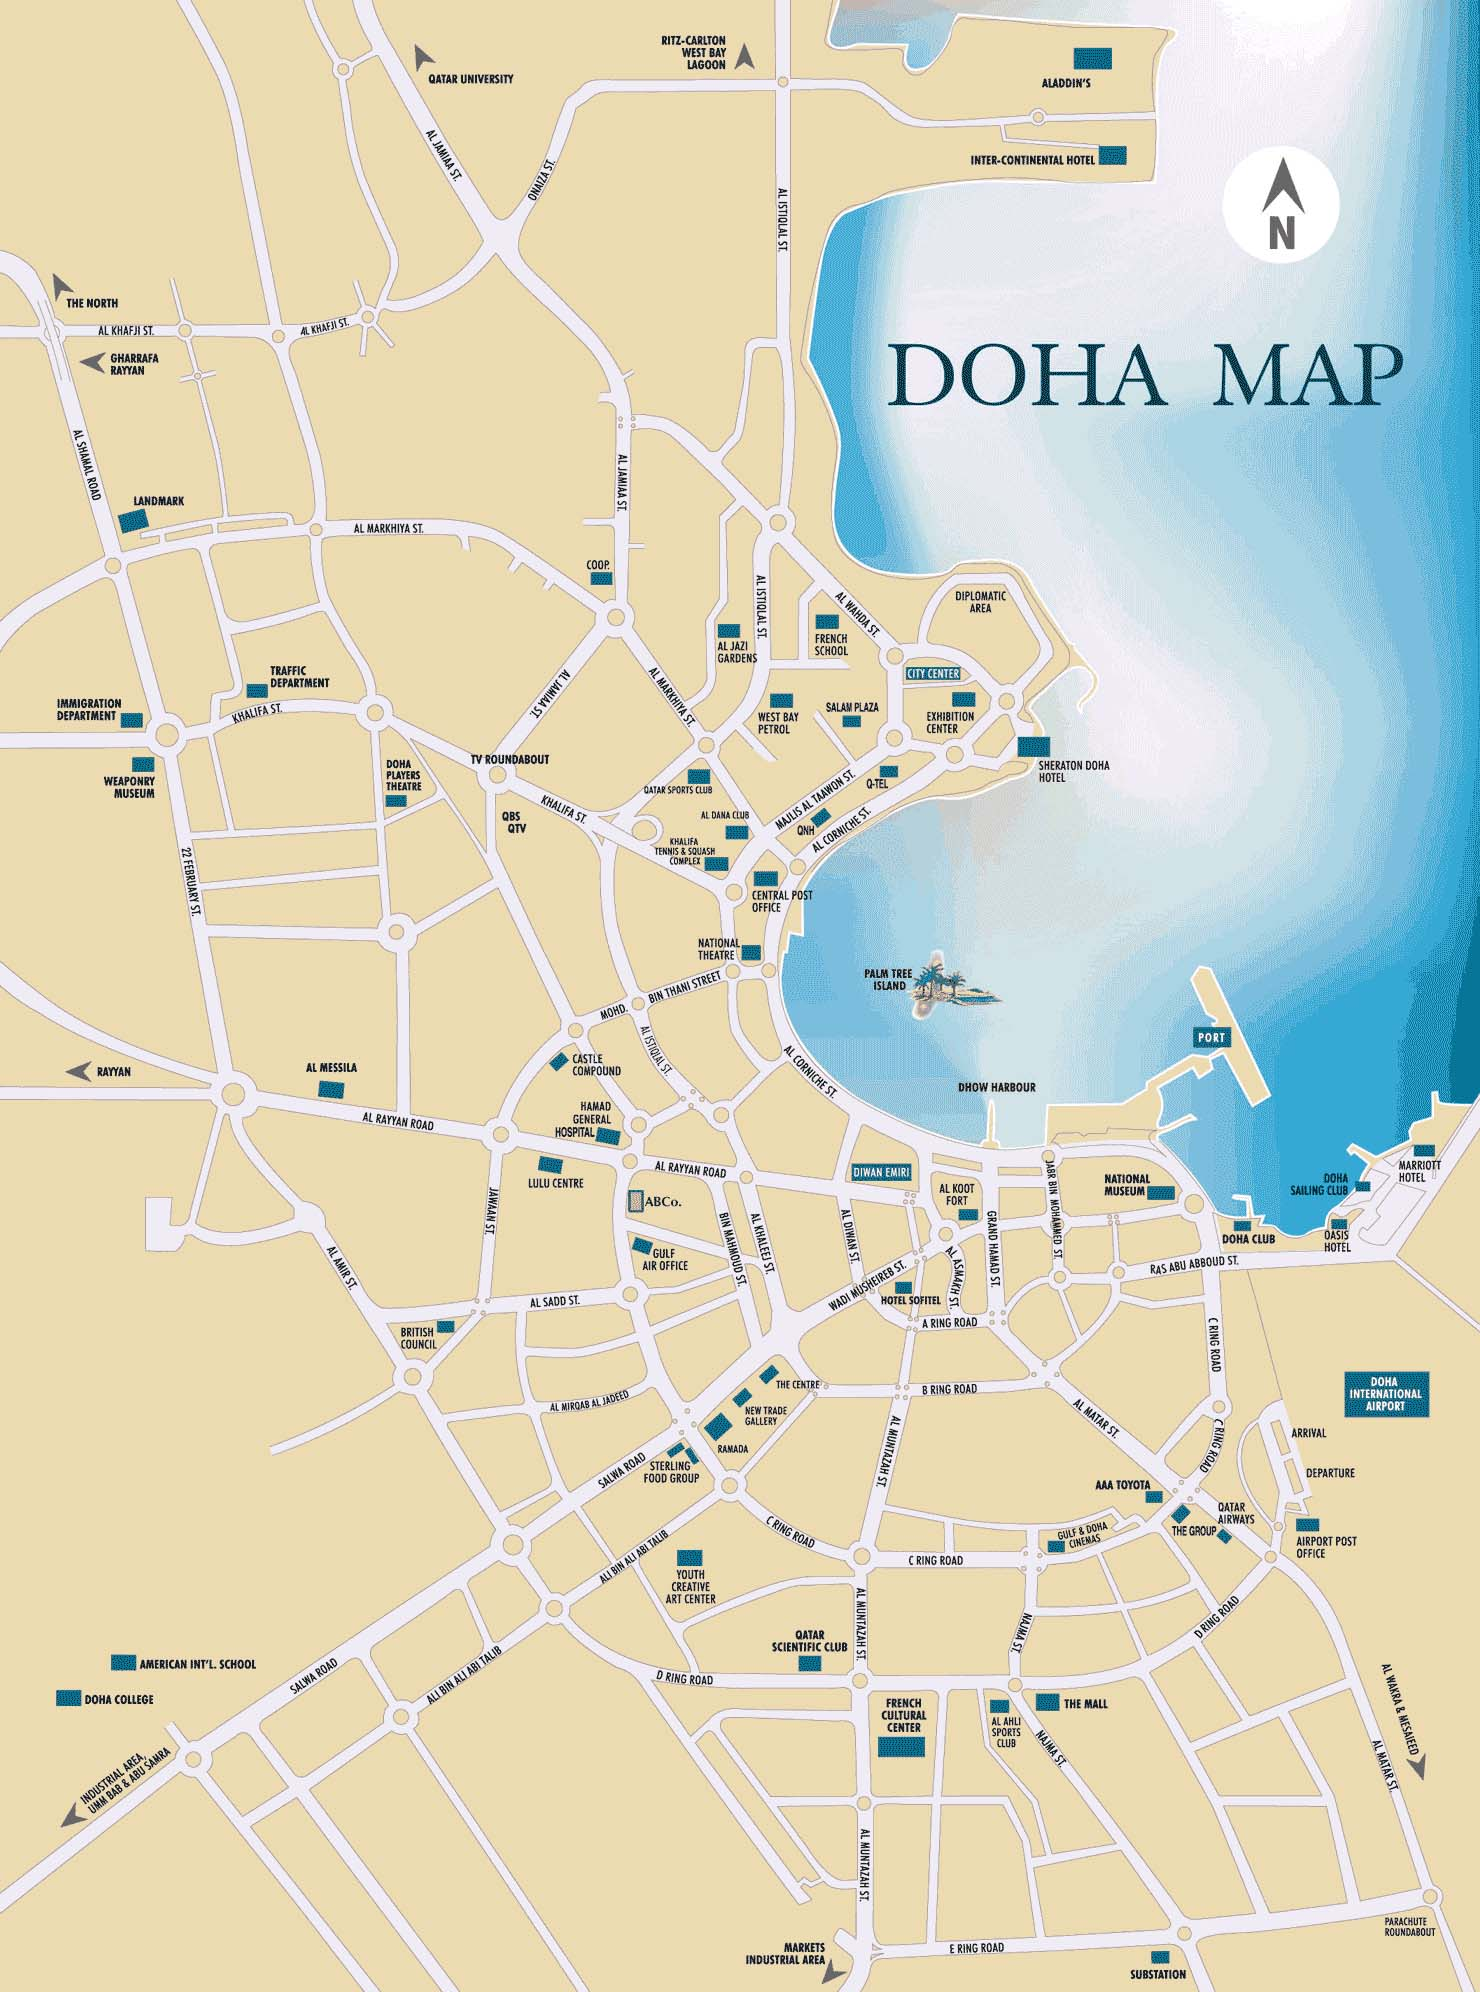 doha karta Doha | Travel Forum doha karta